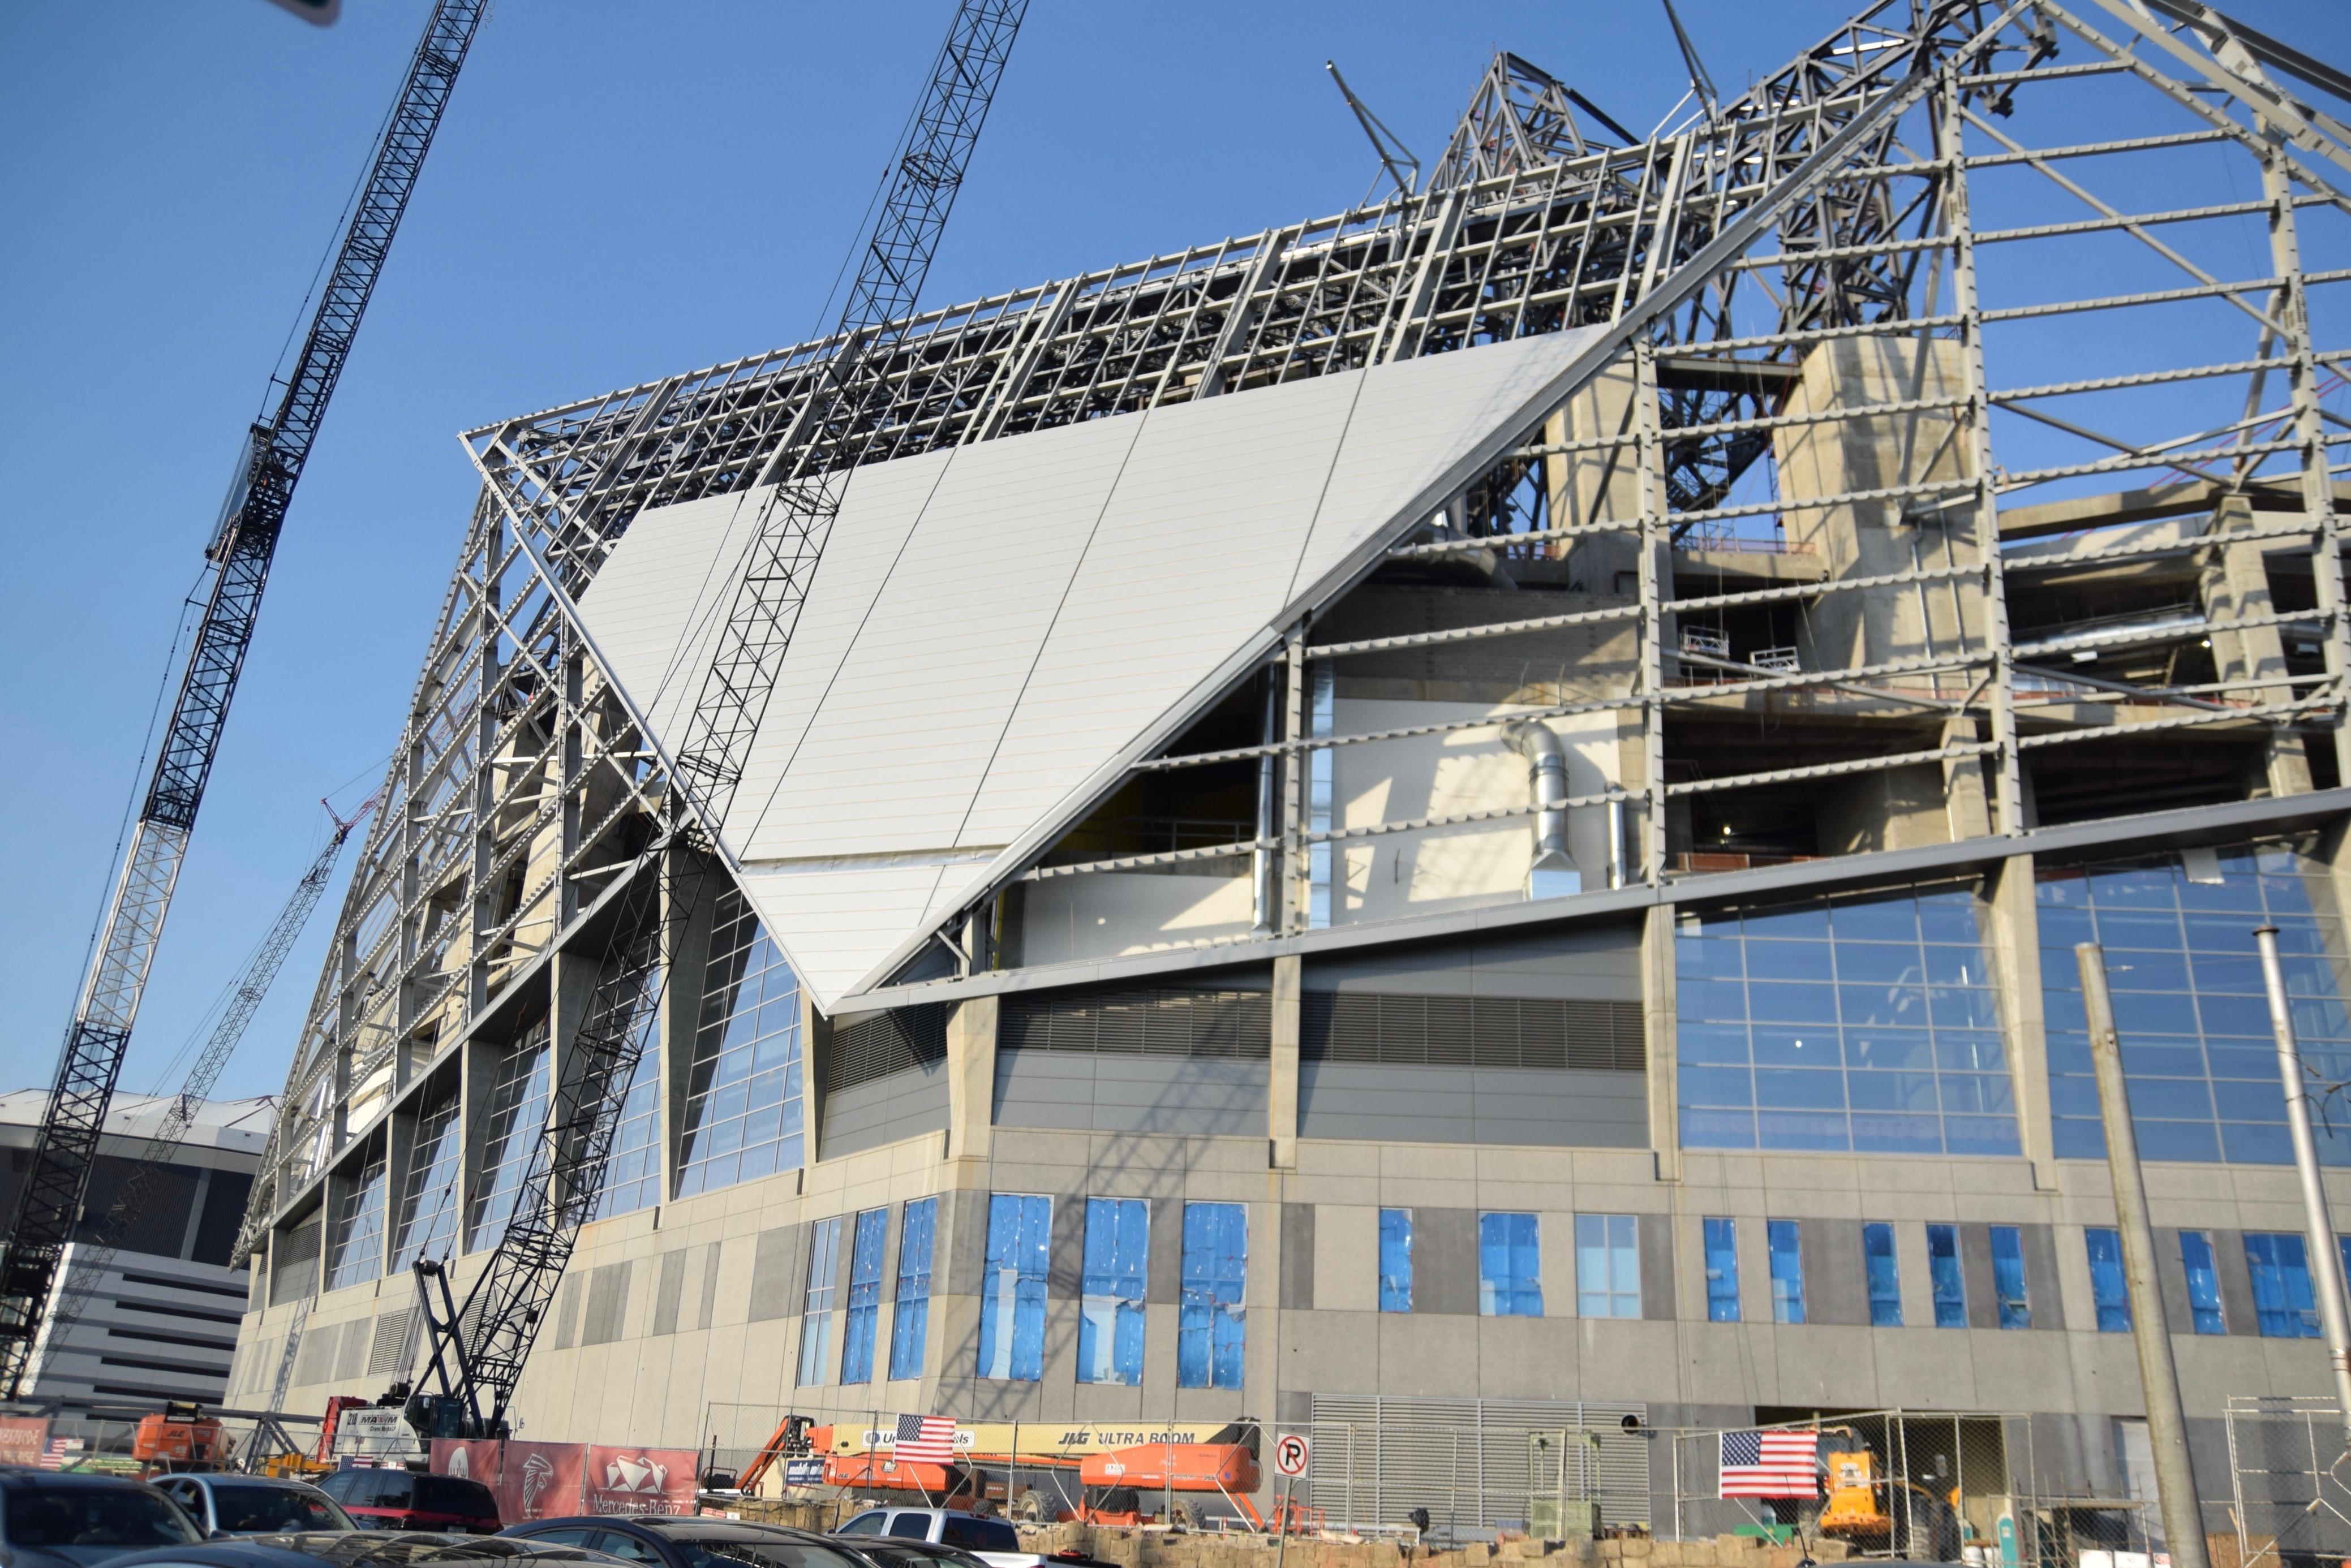 High Hopes For HighTech MercedesBenz Stadium  Despite Delays